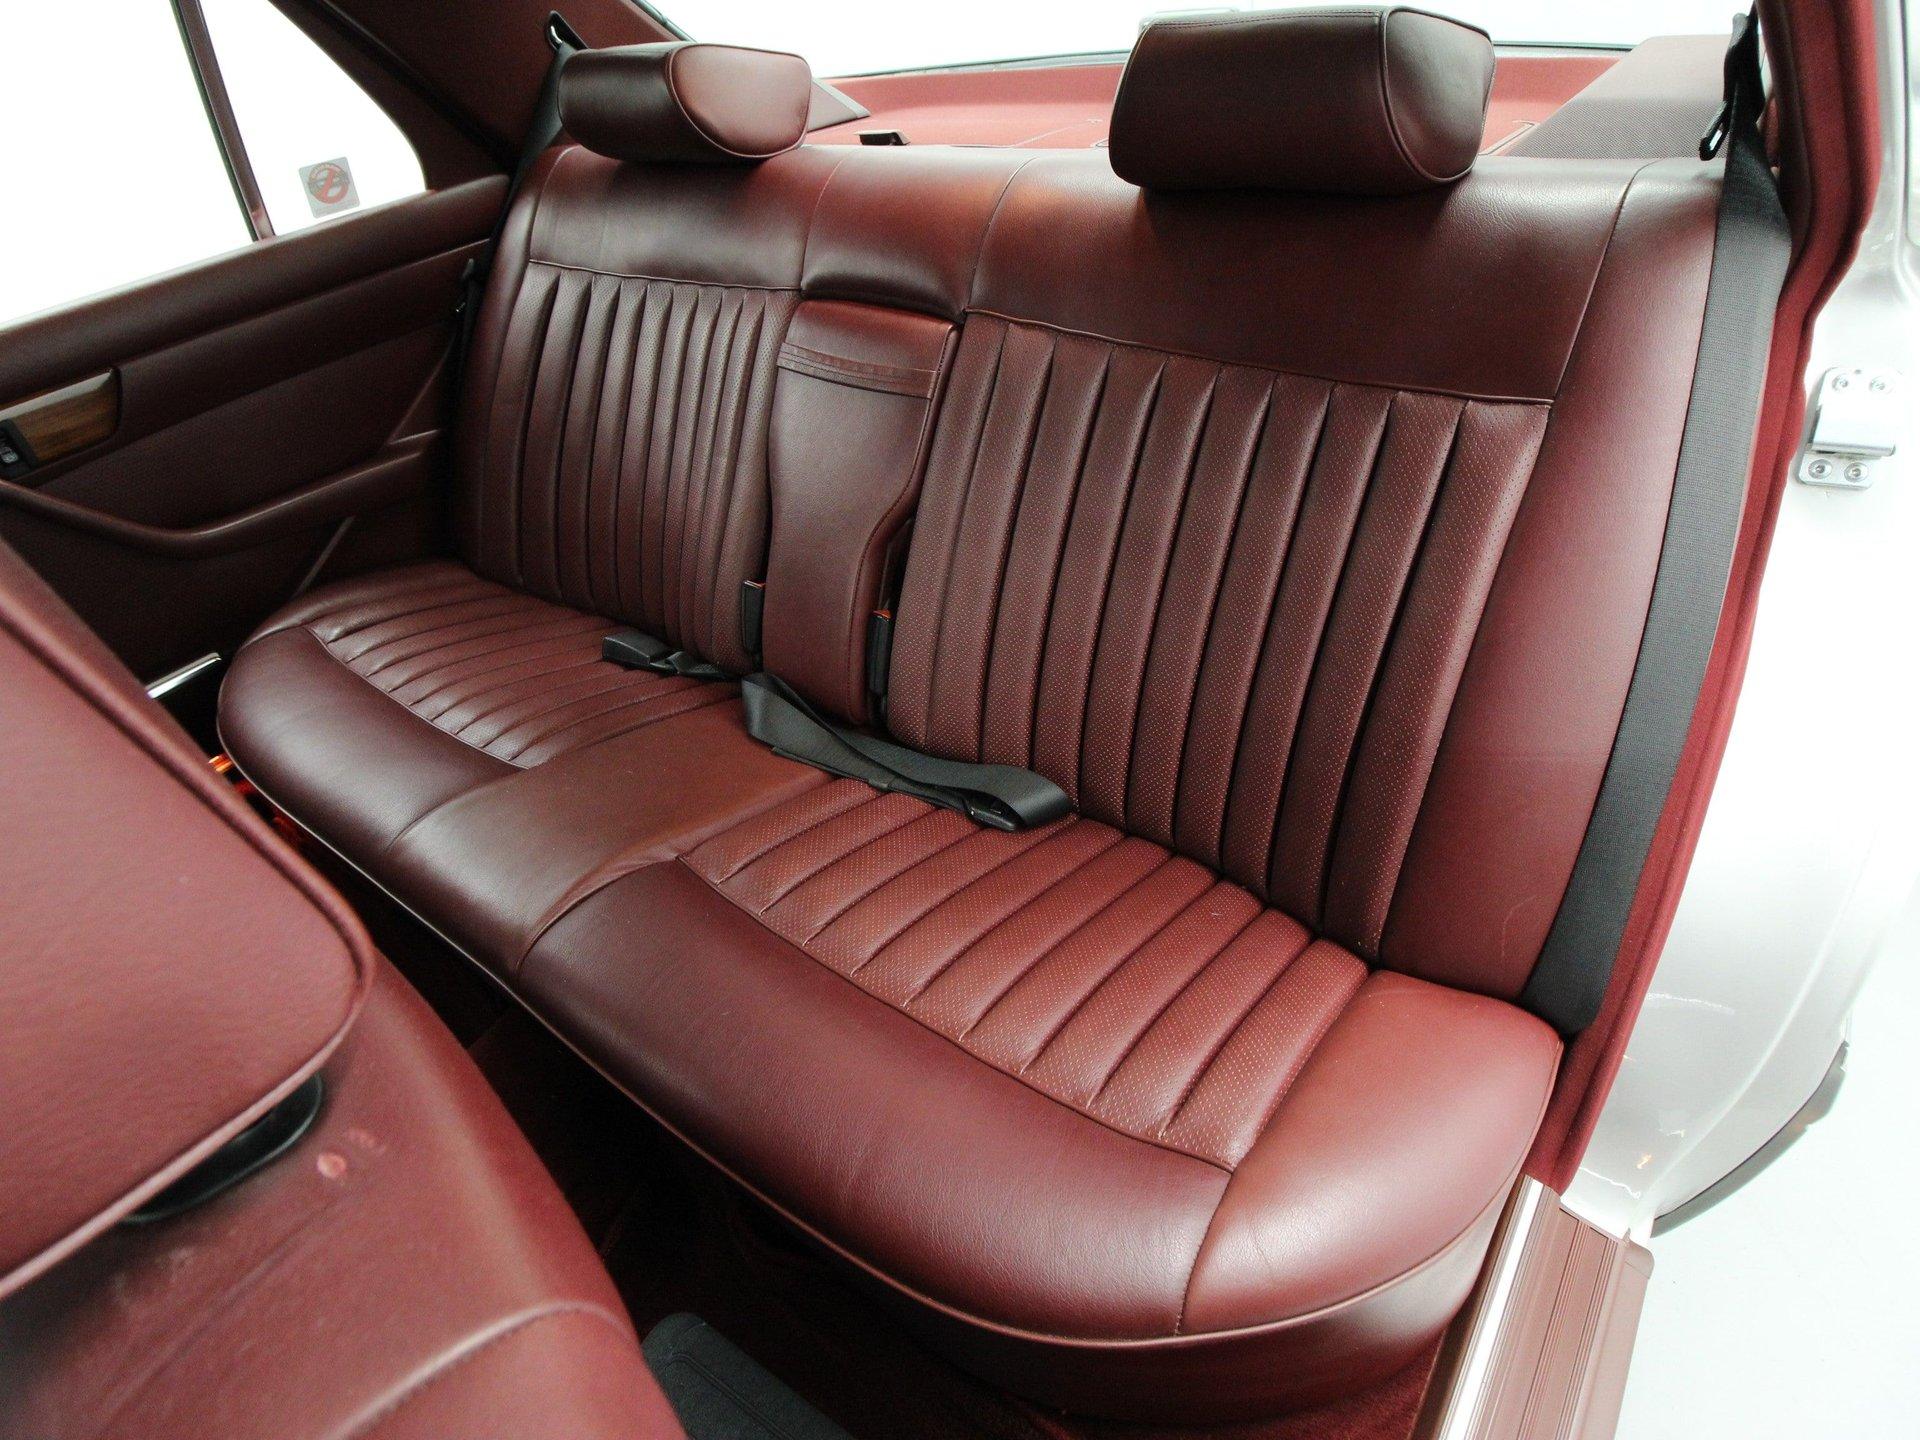 1988 Mercedes-Benz 300